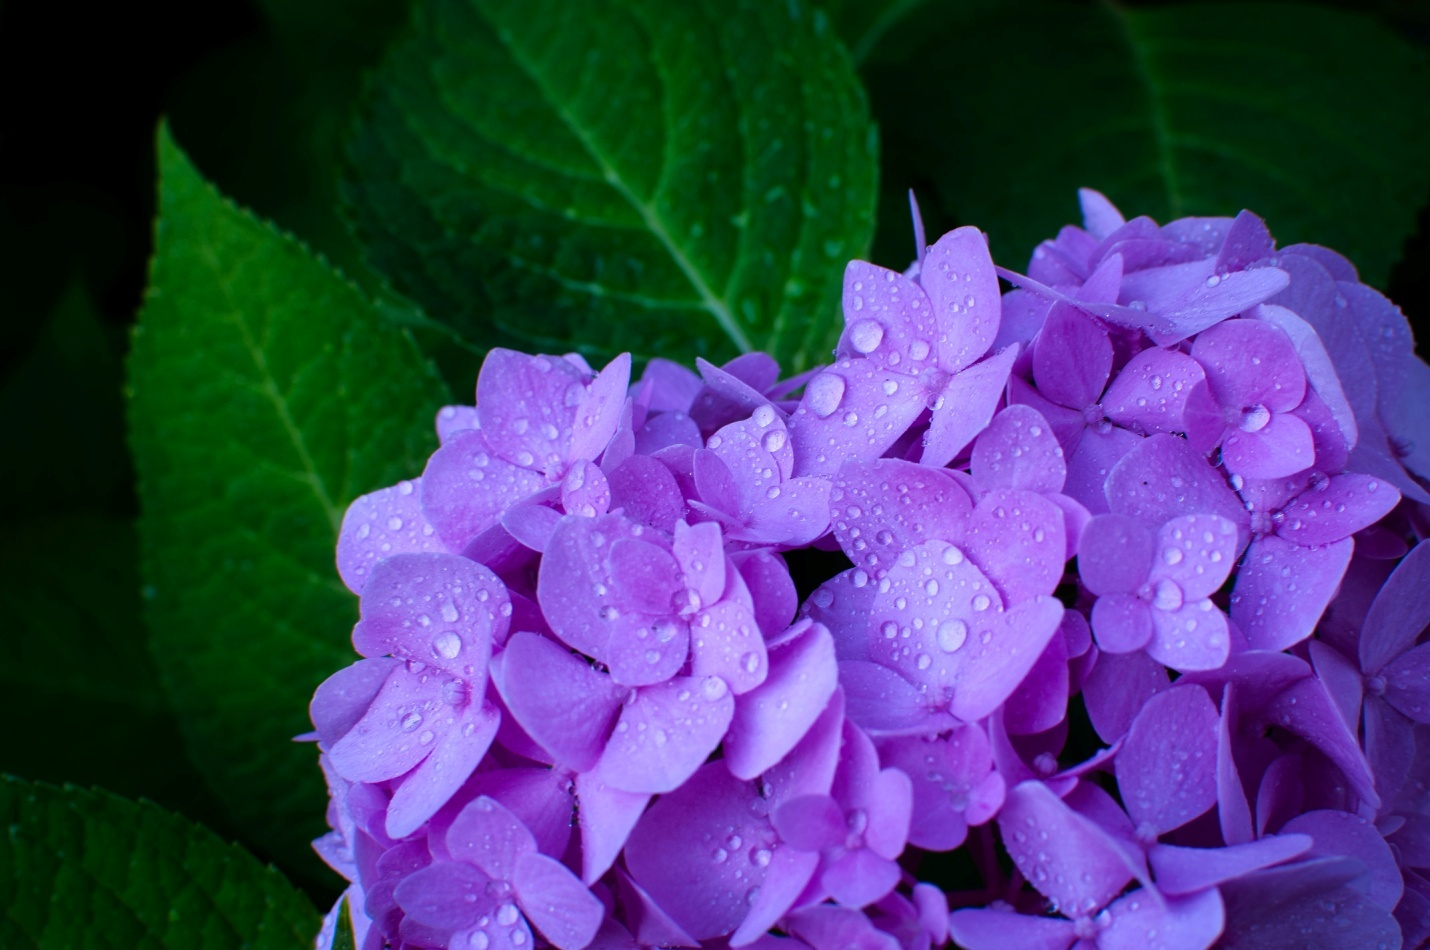 Planting purple flowers